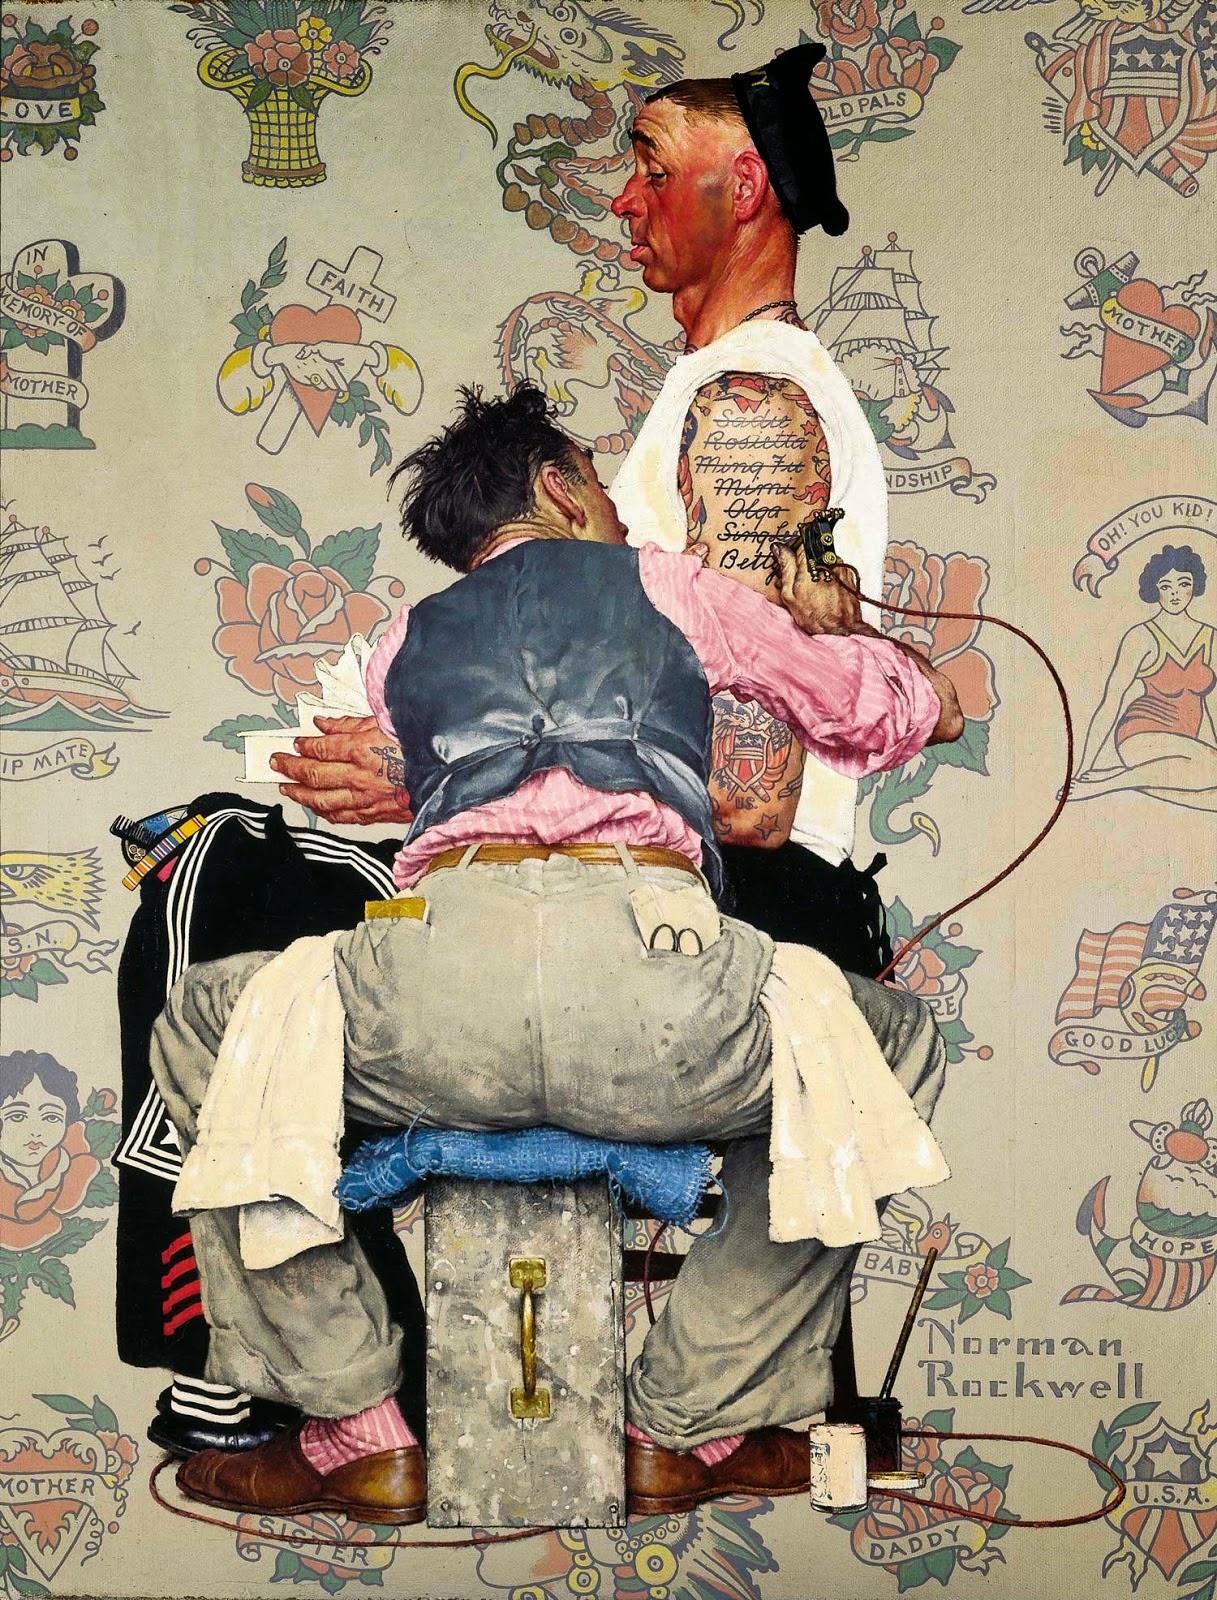 Norman rockwell virtuoso del dibujo tan unico for Norman rockwell tattoo